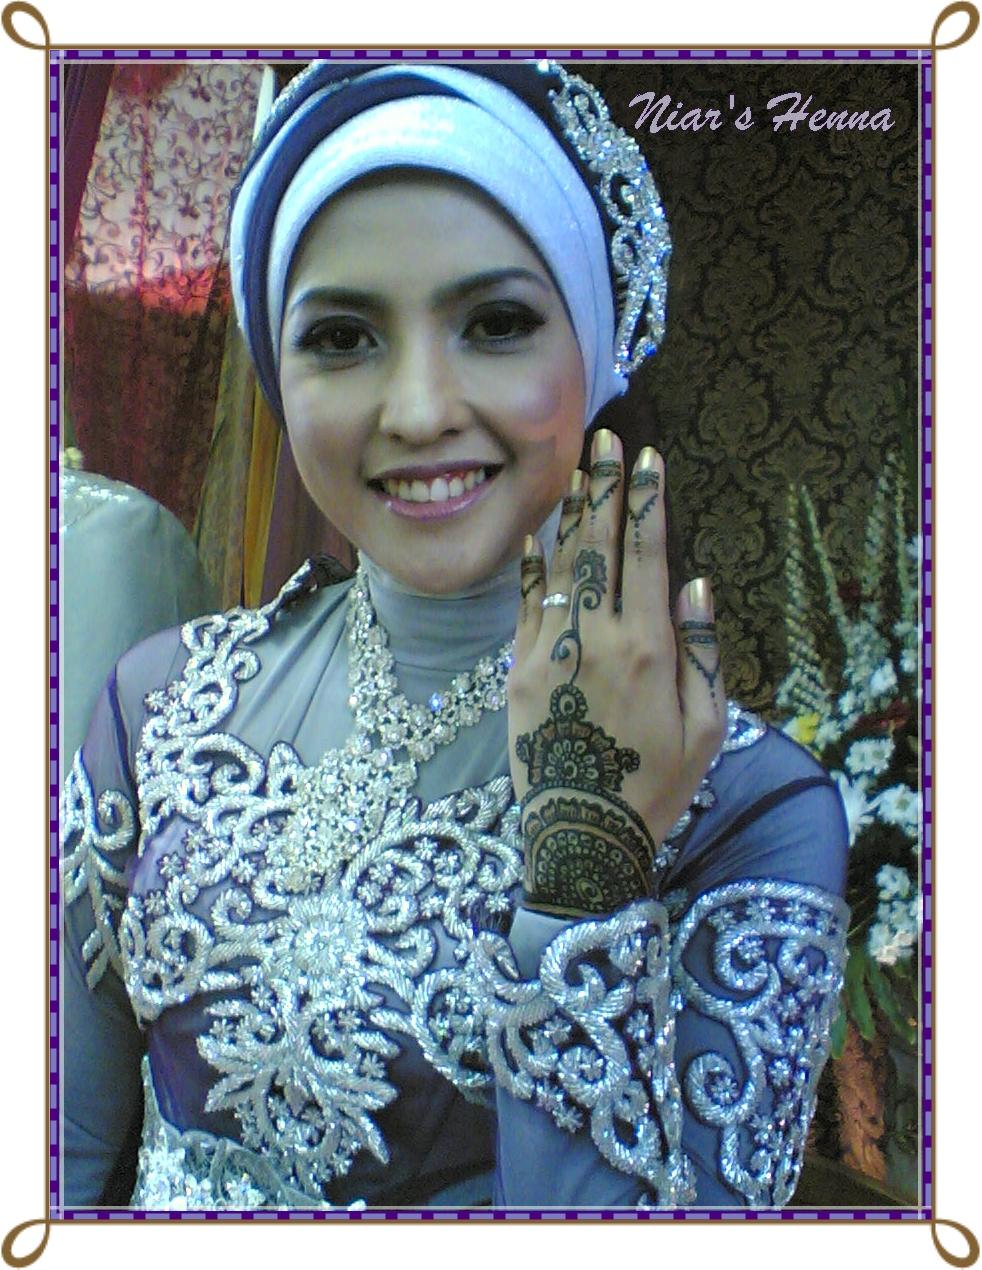 Niar39s Henna